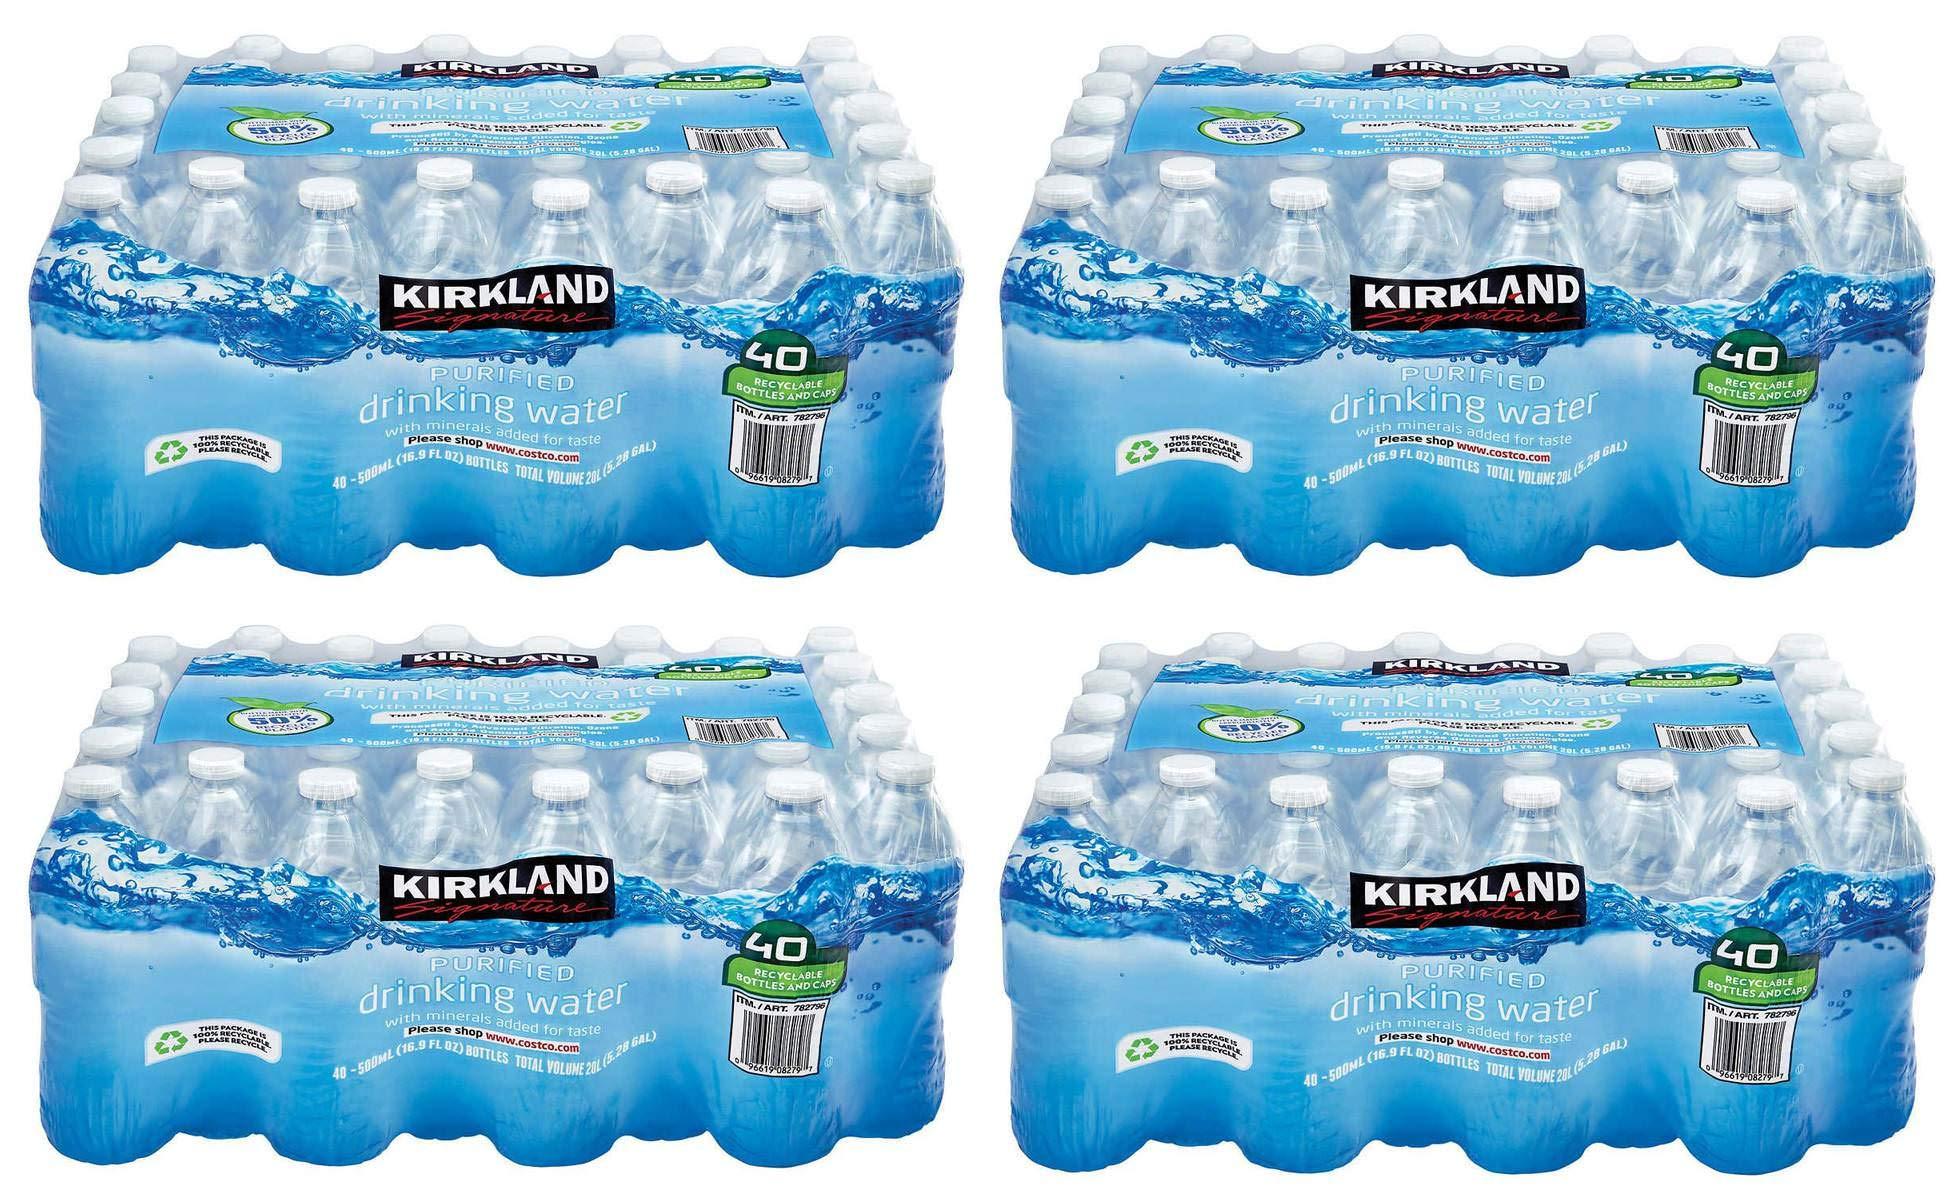 SLTYGJHJ Purified Drinking Water, 16.9 Ounce, 4 Pack of 40 Bottles